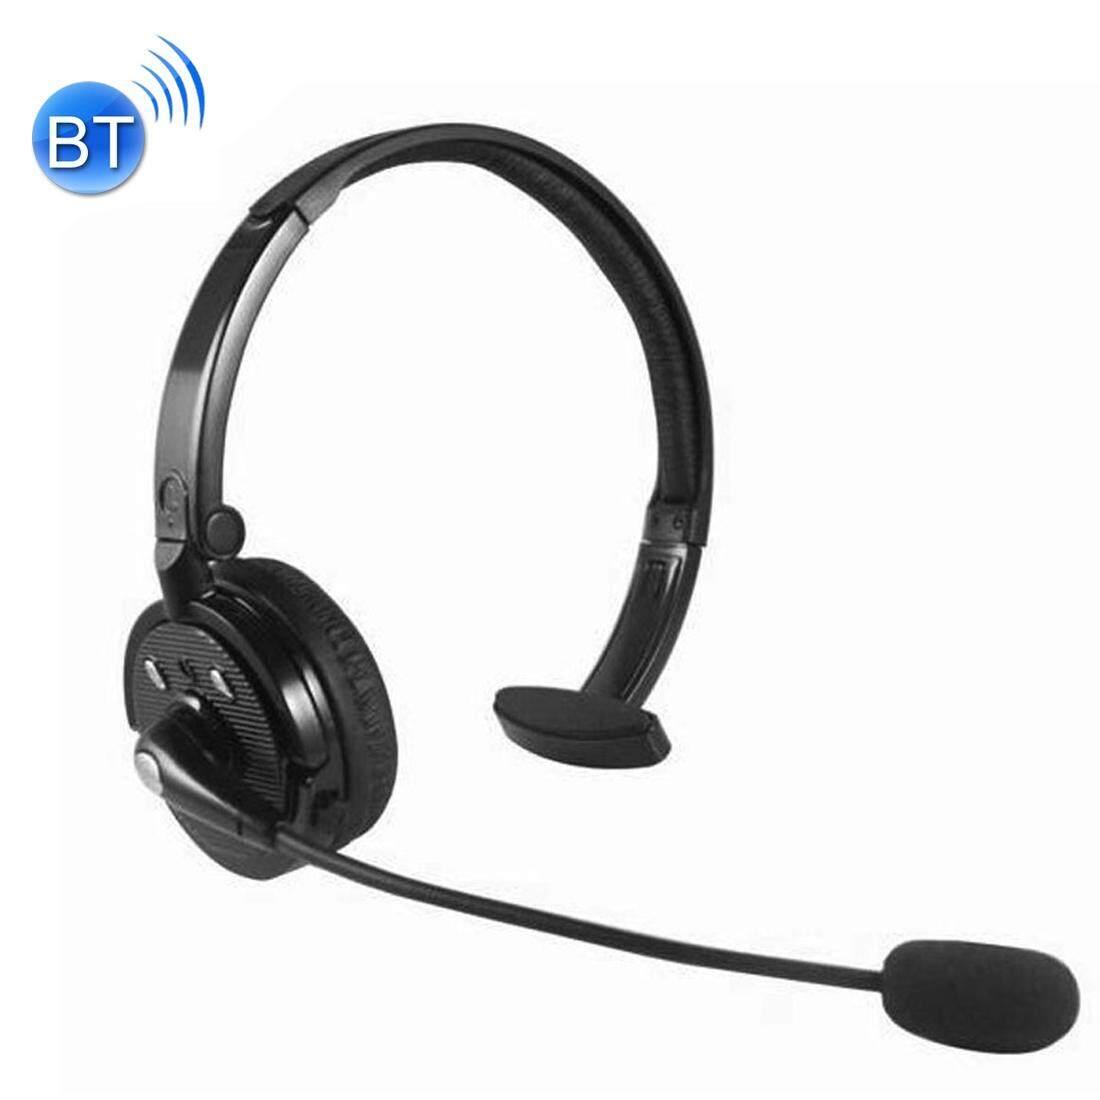 BH-M10B Multi-point Headband Bluetooth Headset Stereo dengan Handsfree Panggilan atau Fungsi Bermain Musik untuk iPhone/Samsung/LG/ HTC/Nokia/Ponsel BlackBerry (Hitam) -Intl